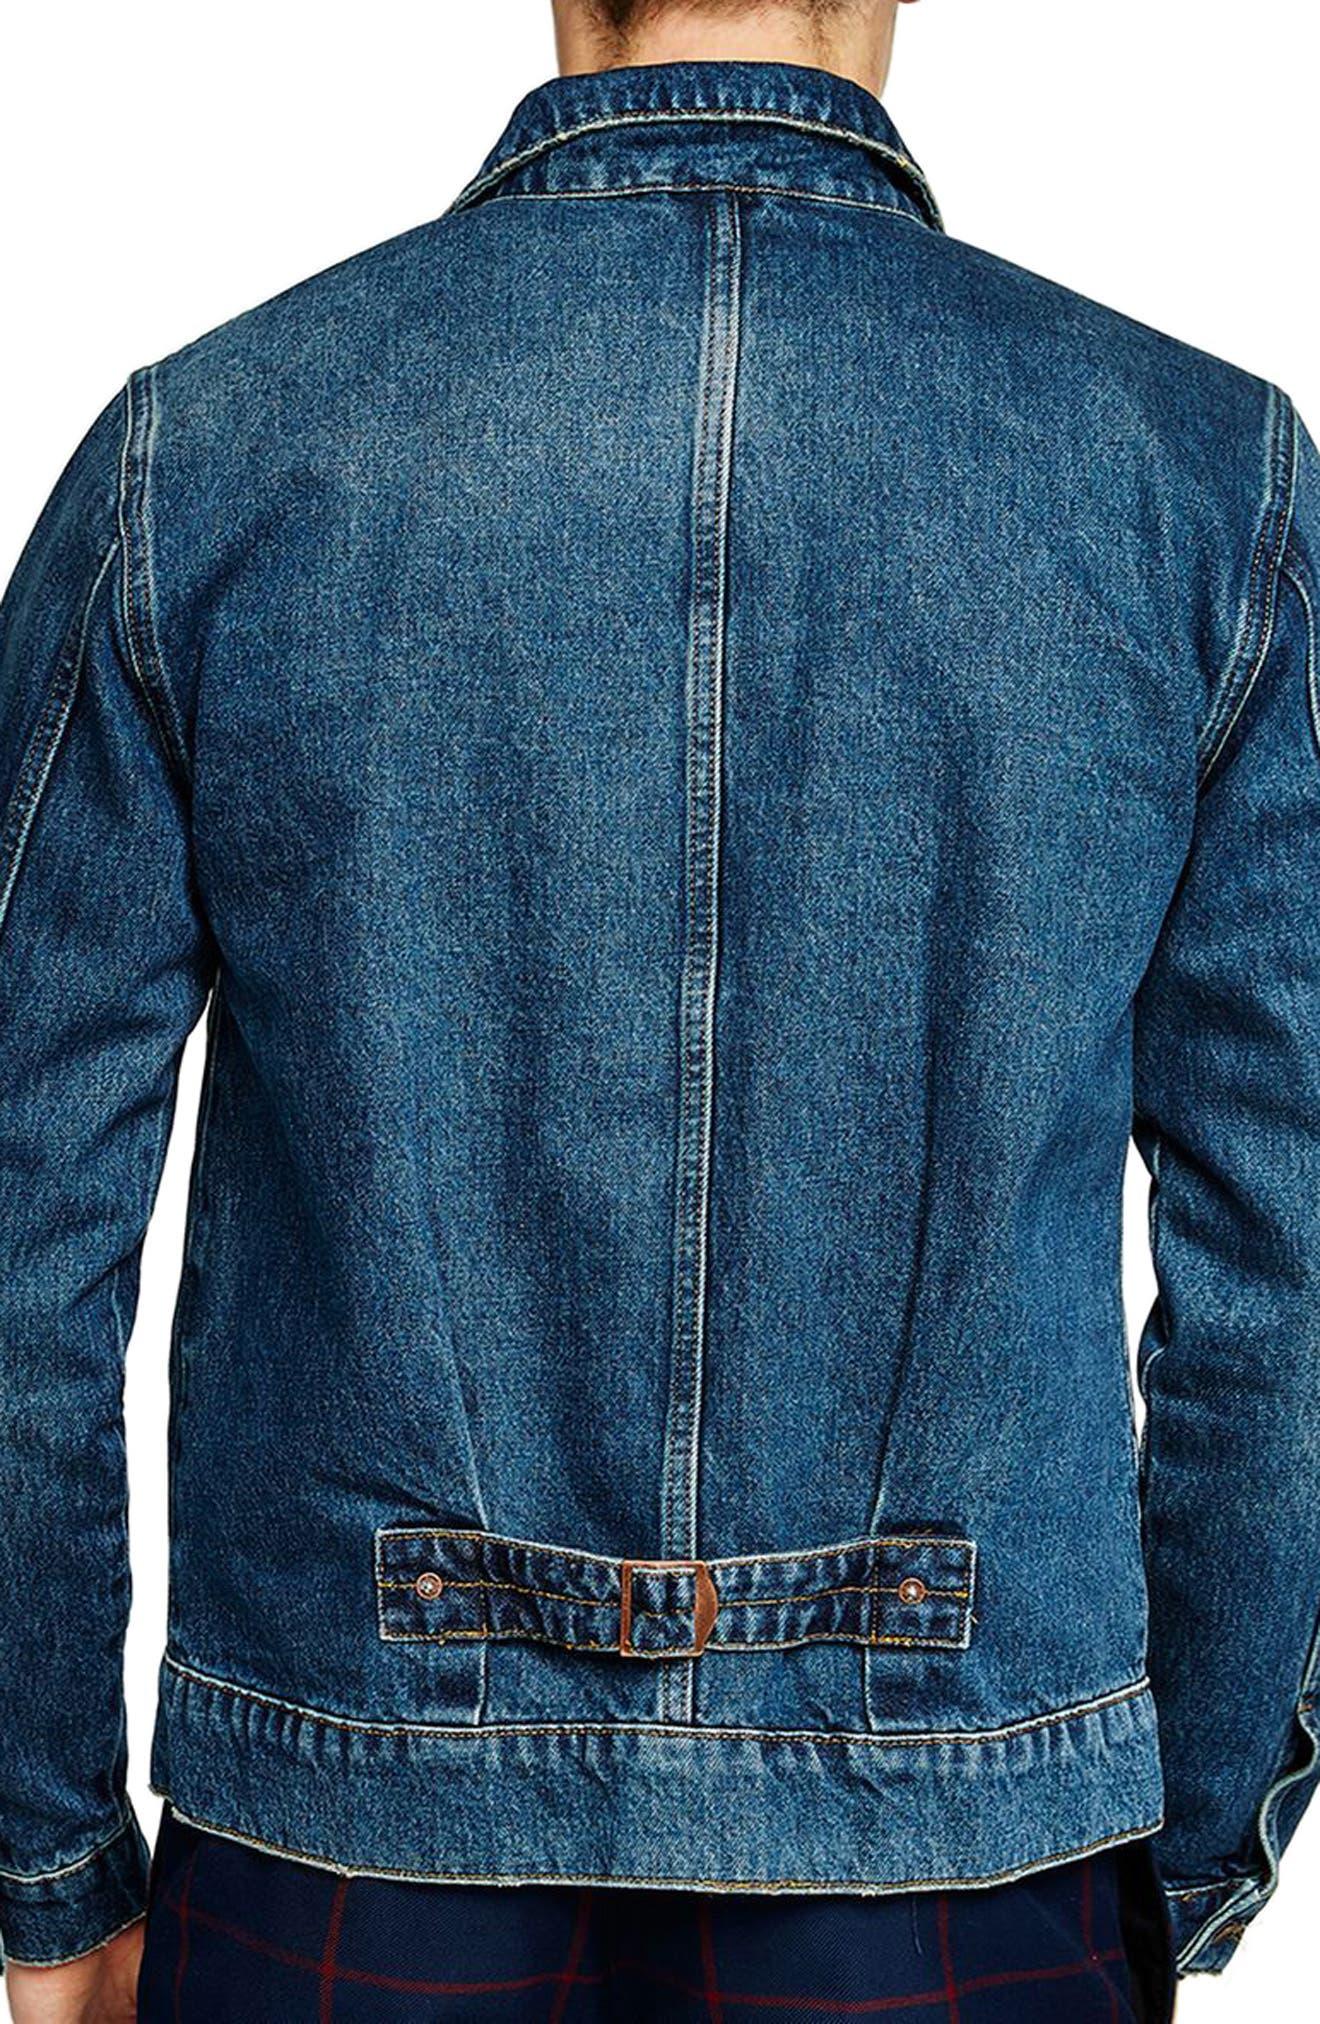 Cinch Back Denim Jacket,                             Alternate thumbnail 2, color,                             Mid Blue